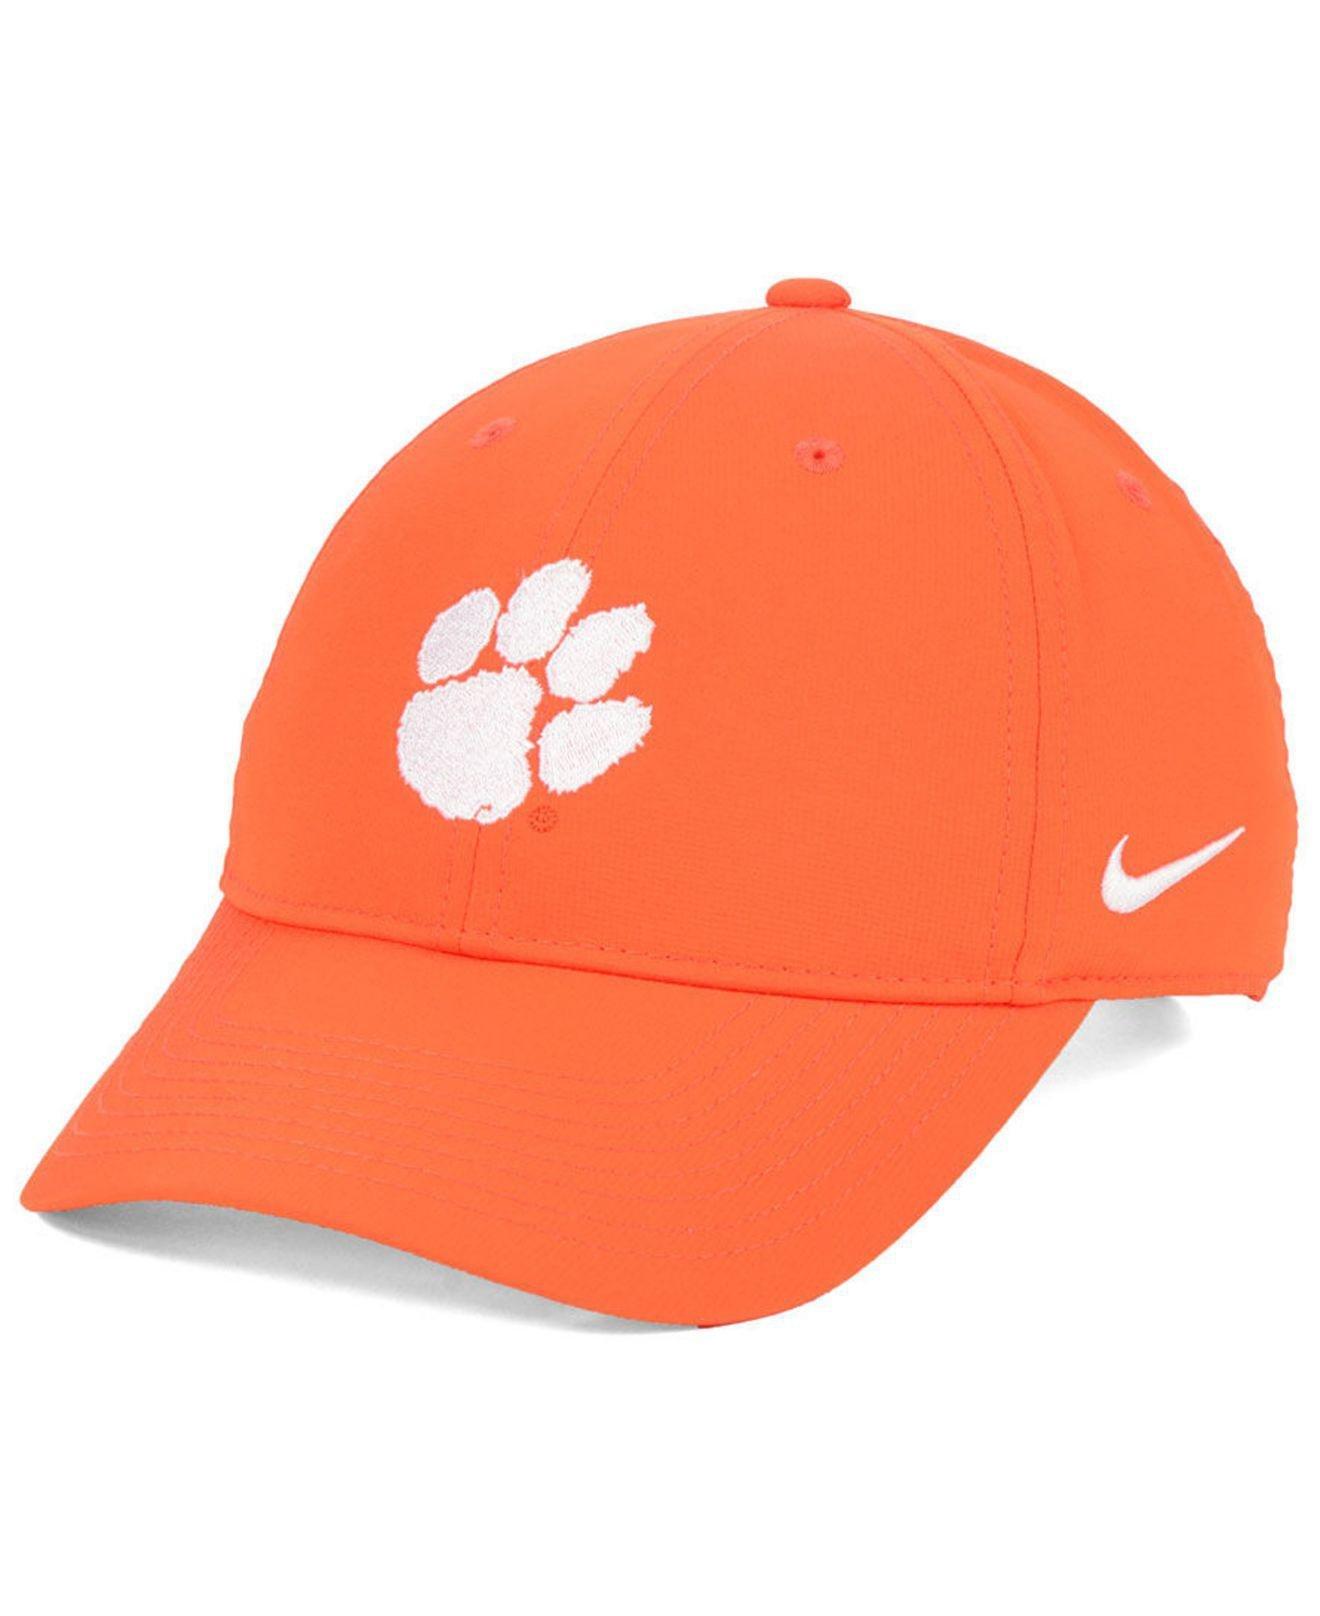 quality design edca7 f8a01 Lyst - Nike Clemson Tigers Dri-fit Adjustable Cap in Orange for Men